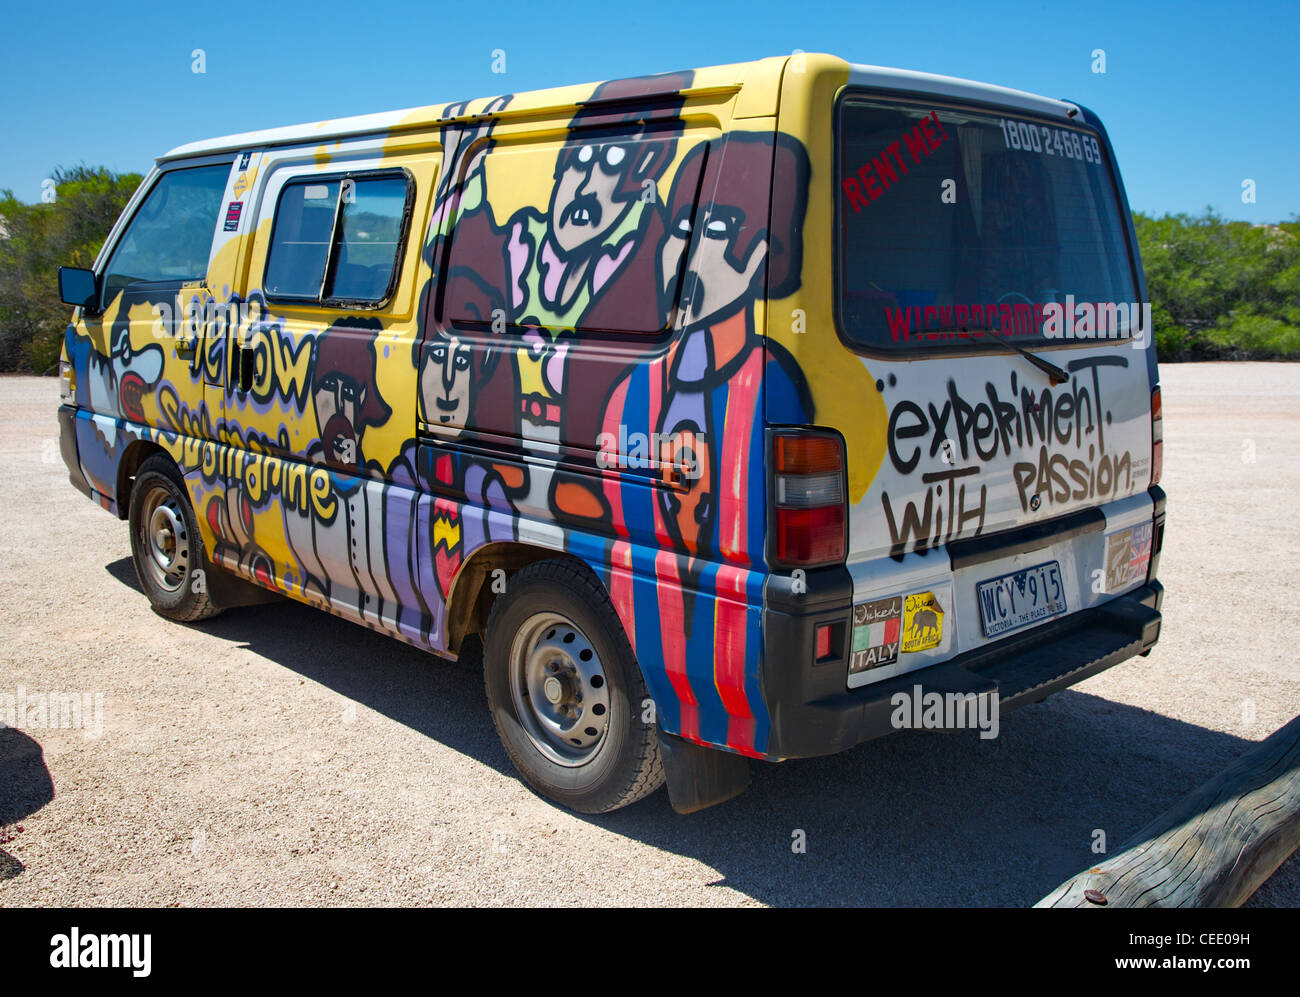 33d3089298decc Wicked Campers Beatles Yellow Submarine camper van in a Western Australia  car park